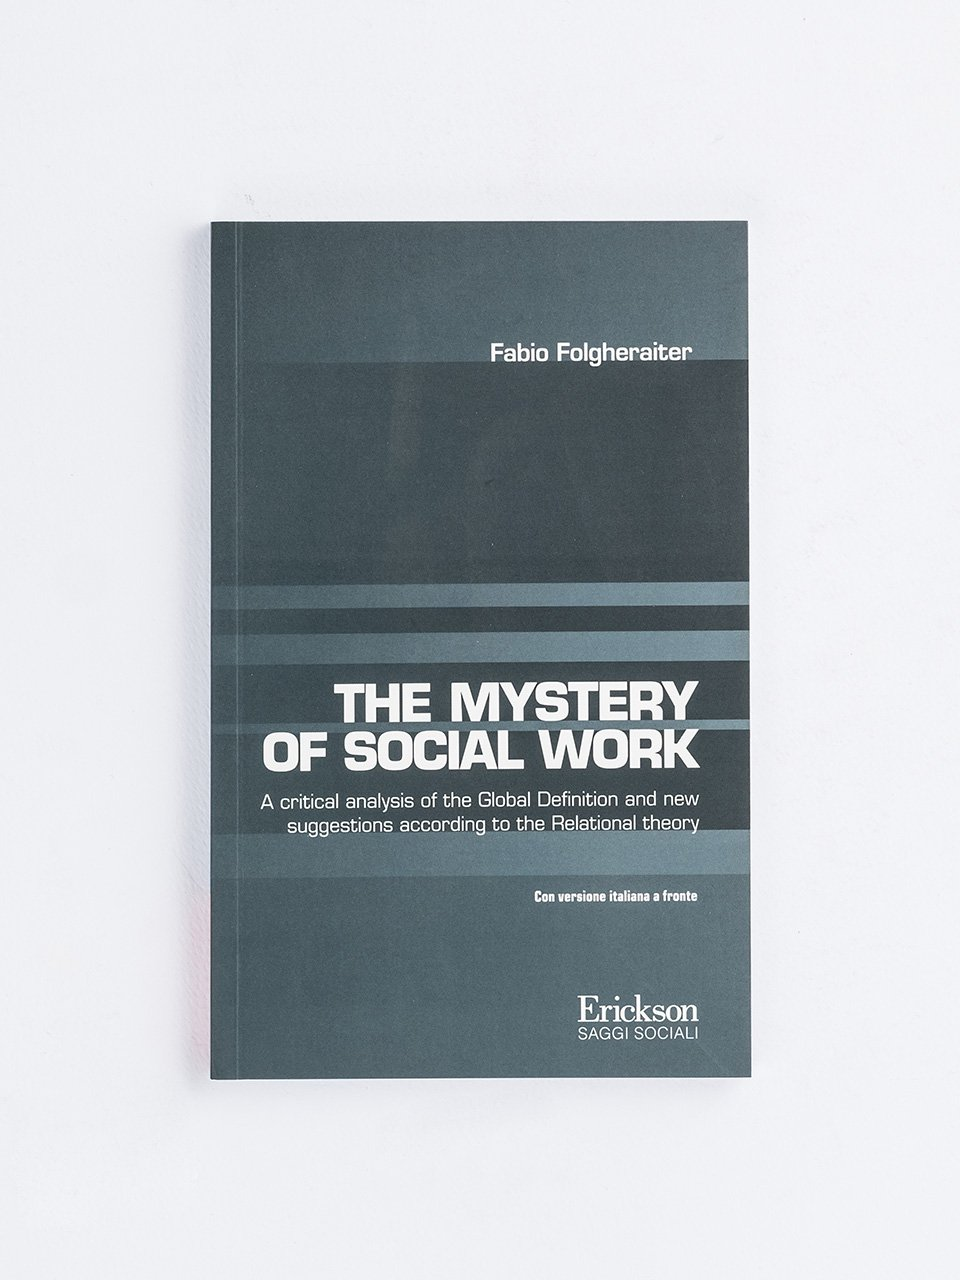 The Mystery of Social Work - Fabio Folgheraiter - Erickson